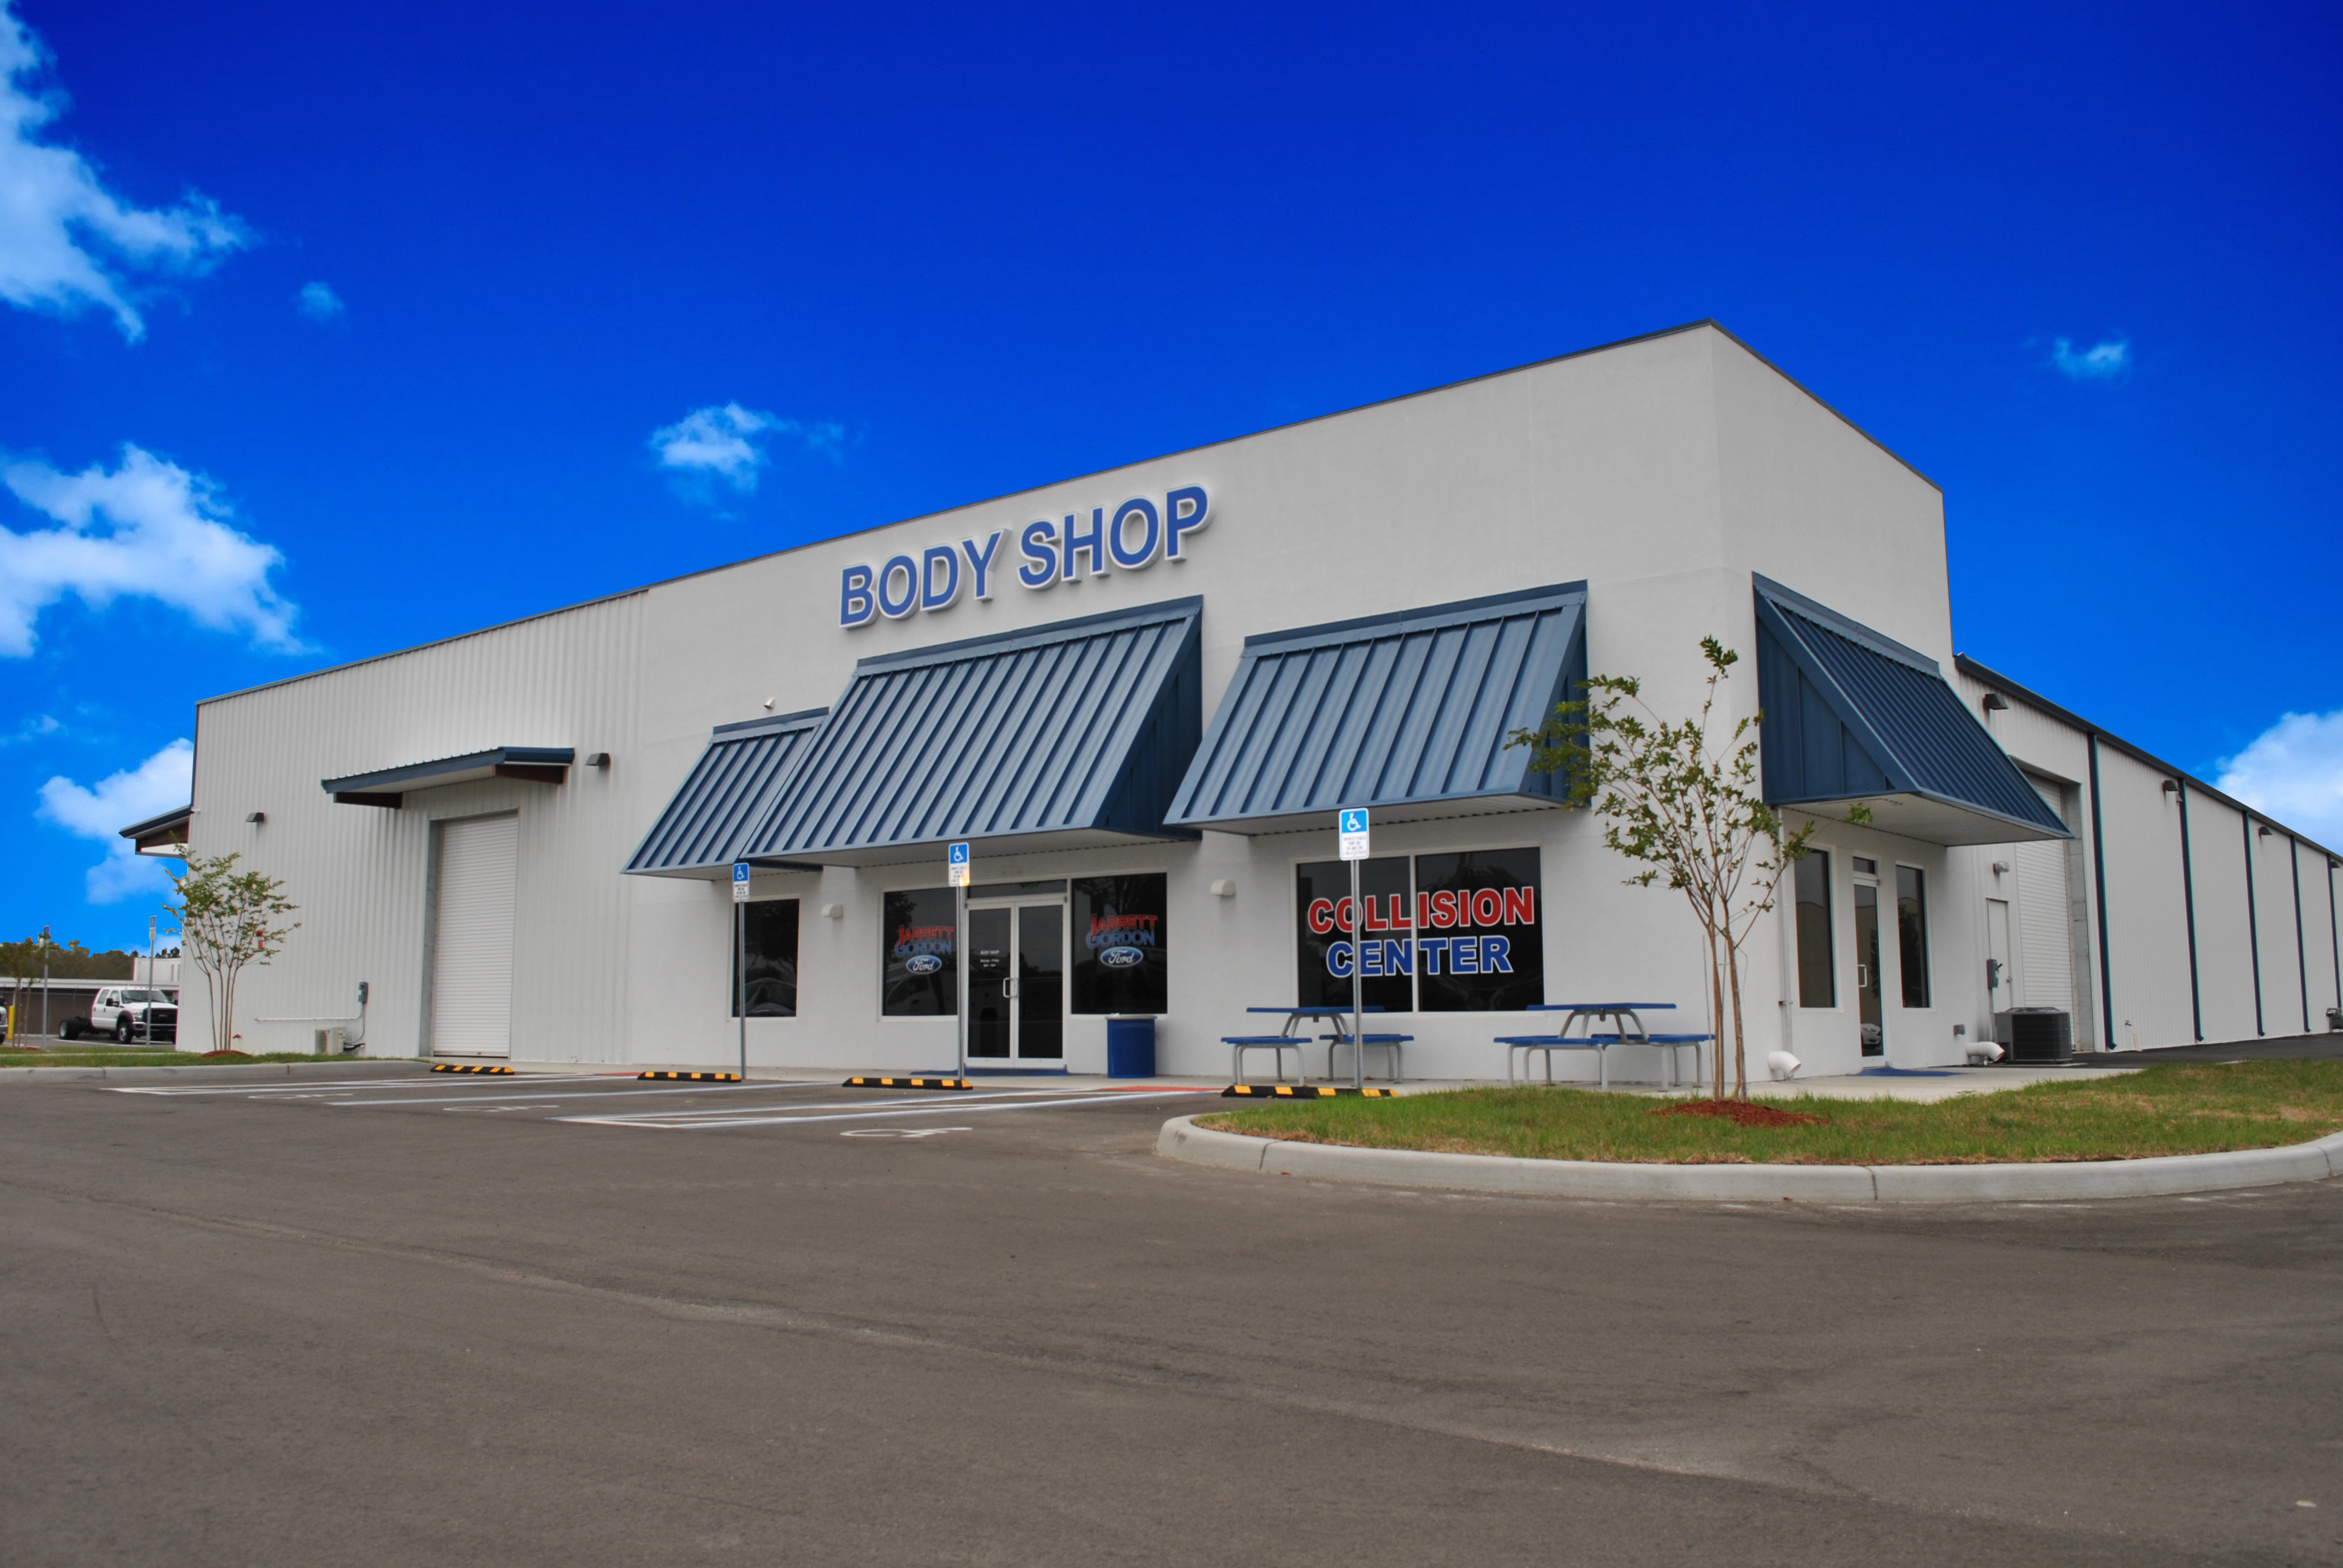 Body Shop Jarrett Gordon Forddavenport